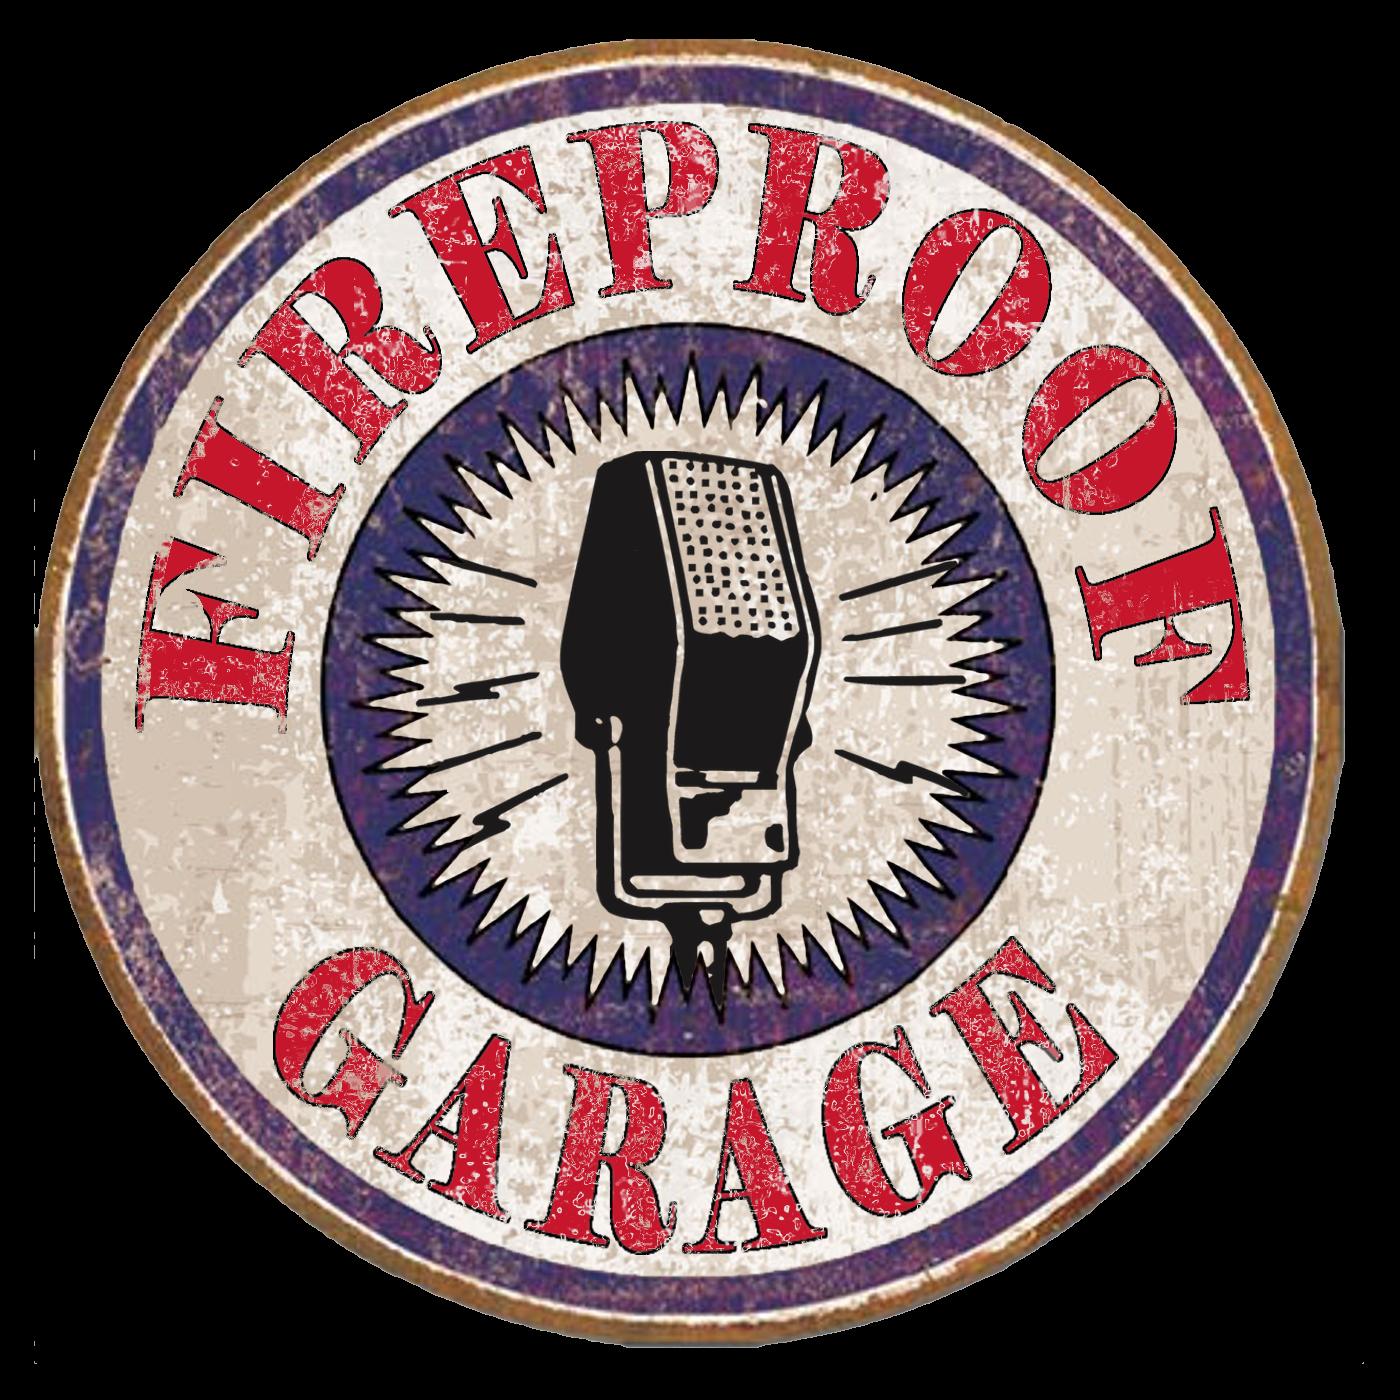 Fireproof Garage